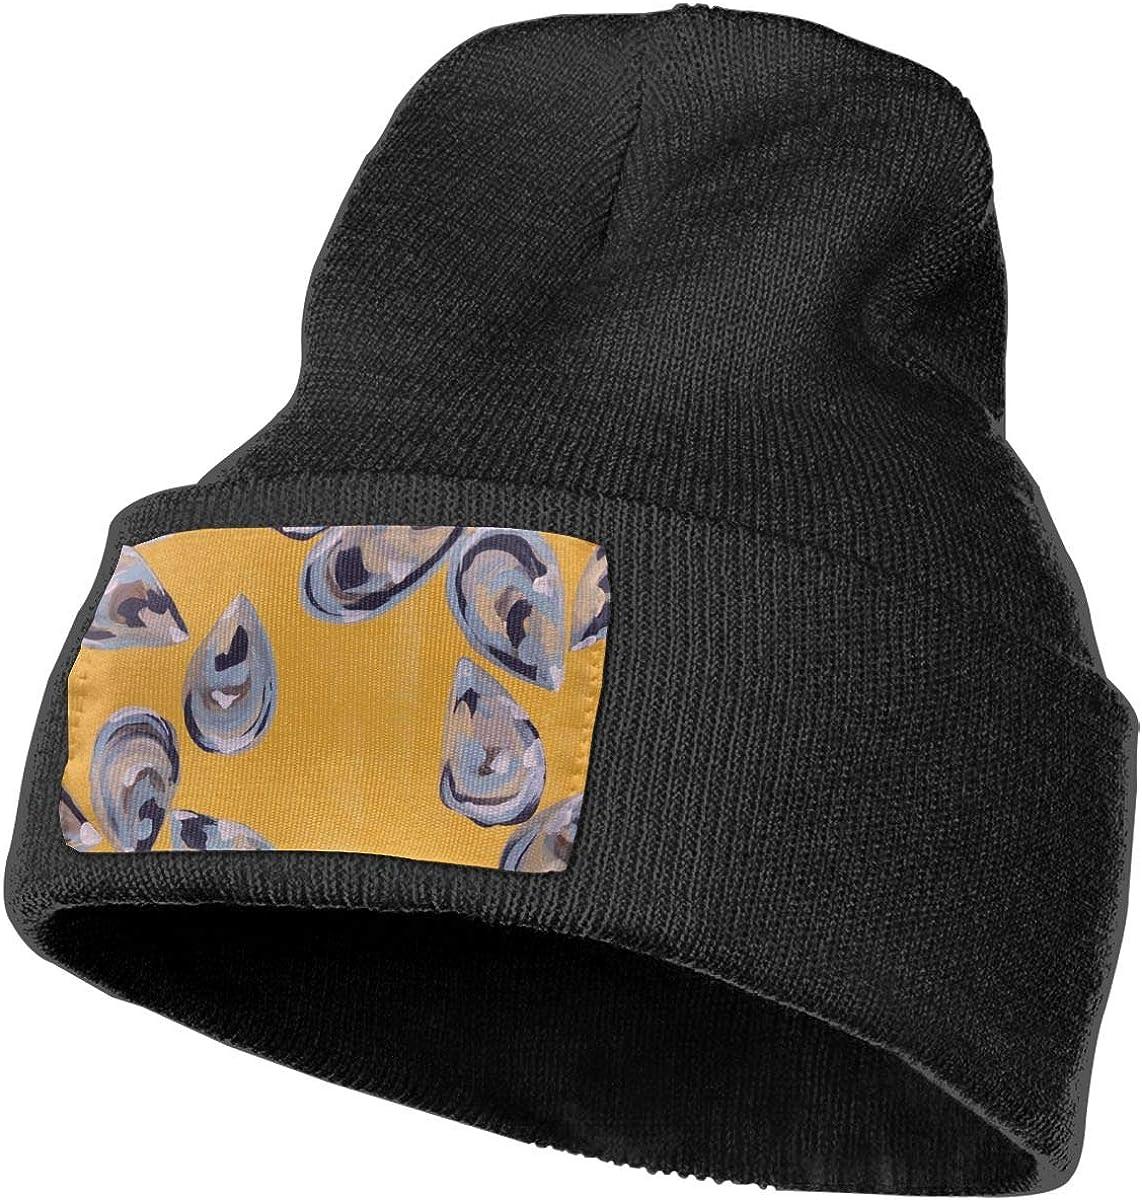 COJOP Lemon Oyster Winter 25% OFF Beanie Max 56% OFF Cuffed Knit Skull Plain Unisex